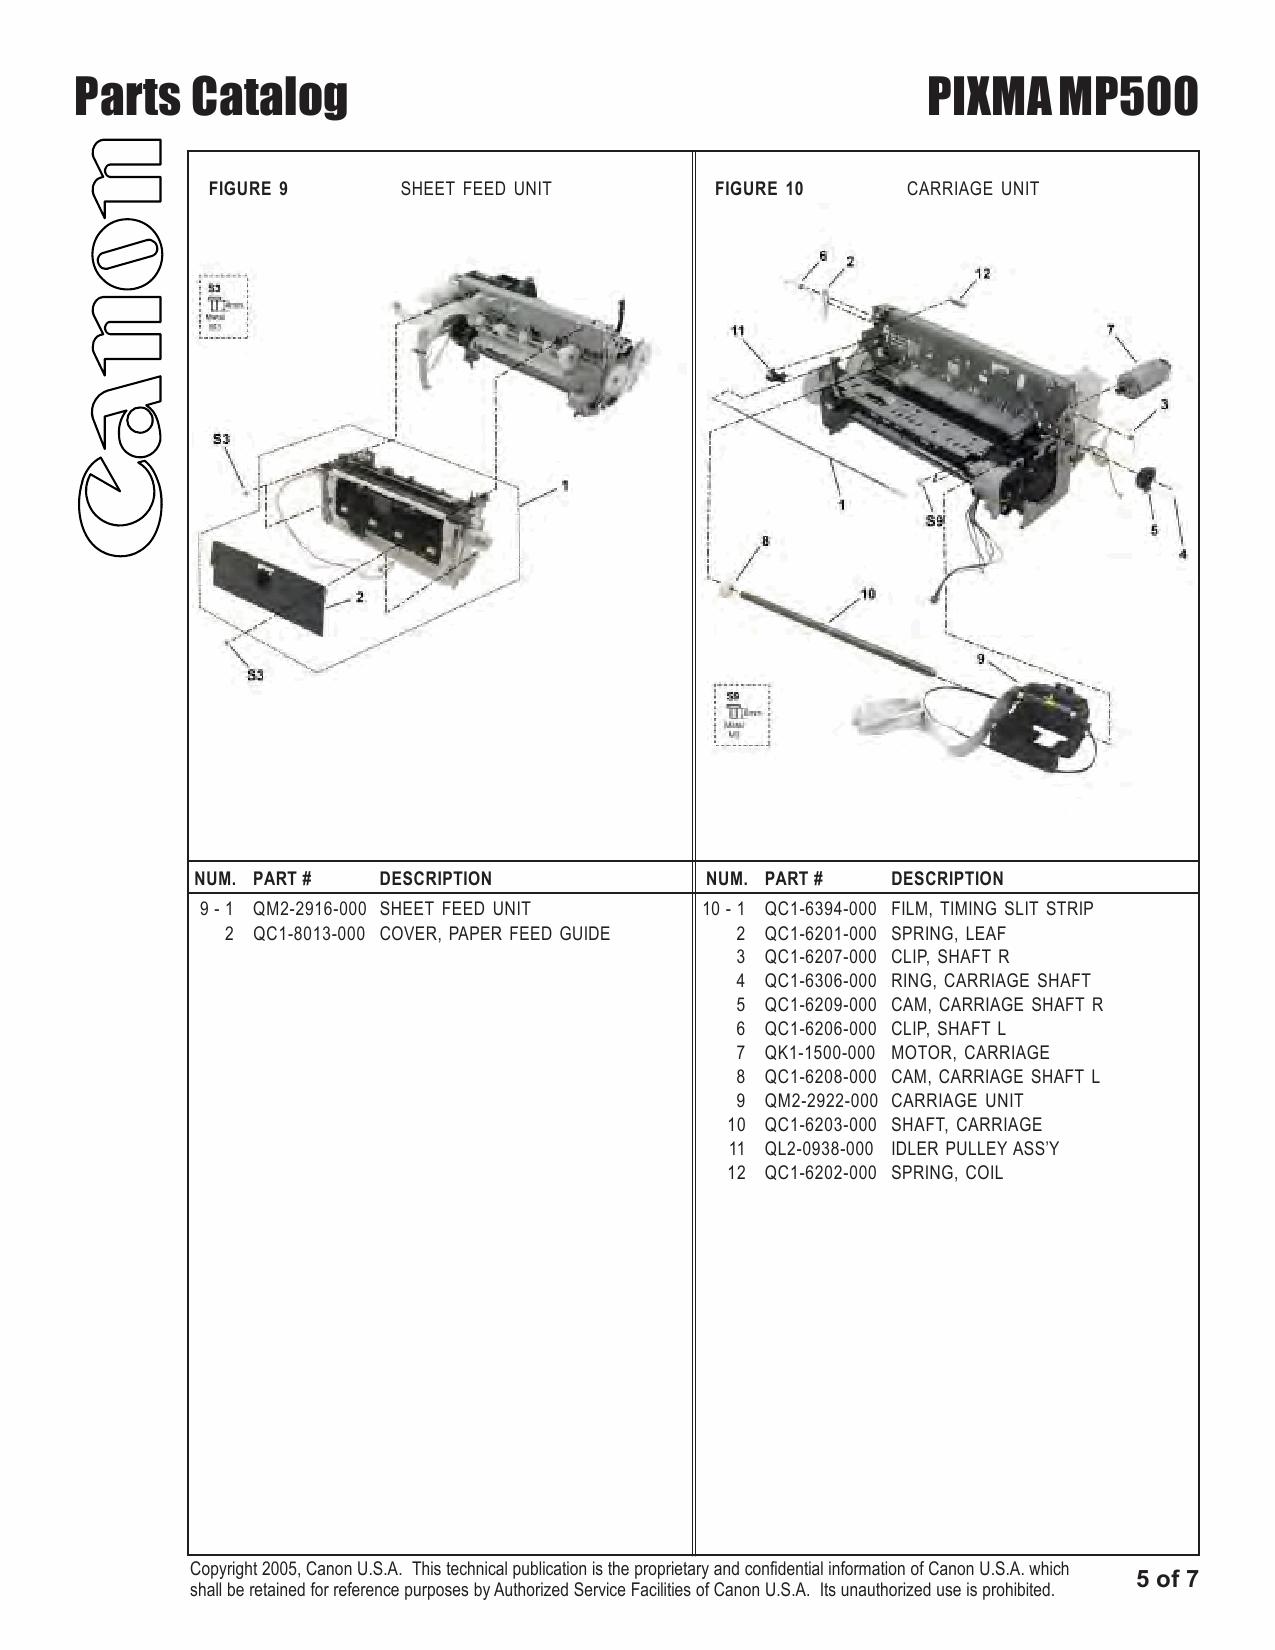 Canon PIXMA MP500 Parts Catalog Manual-6